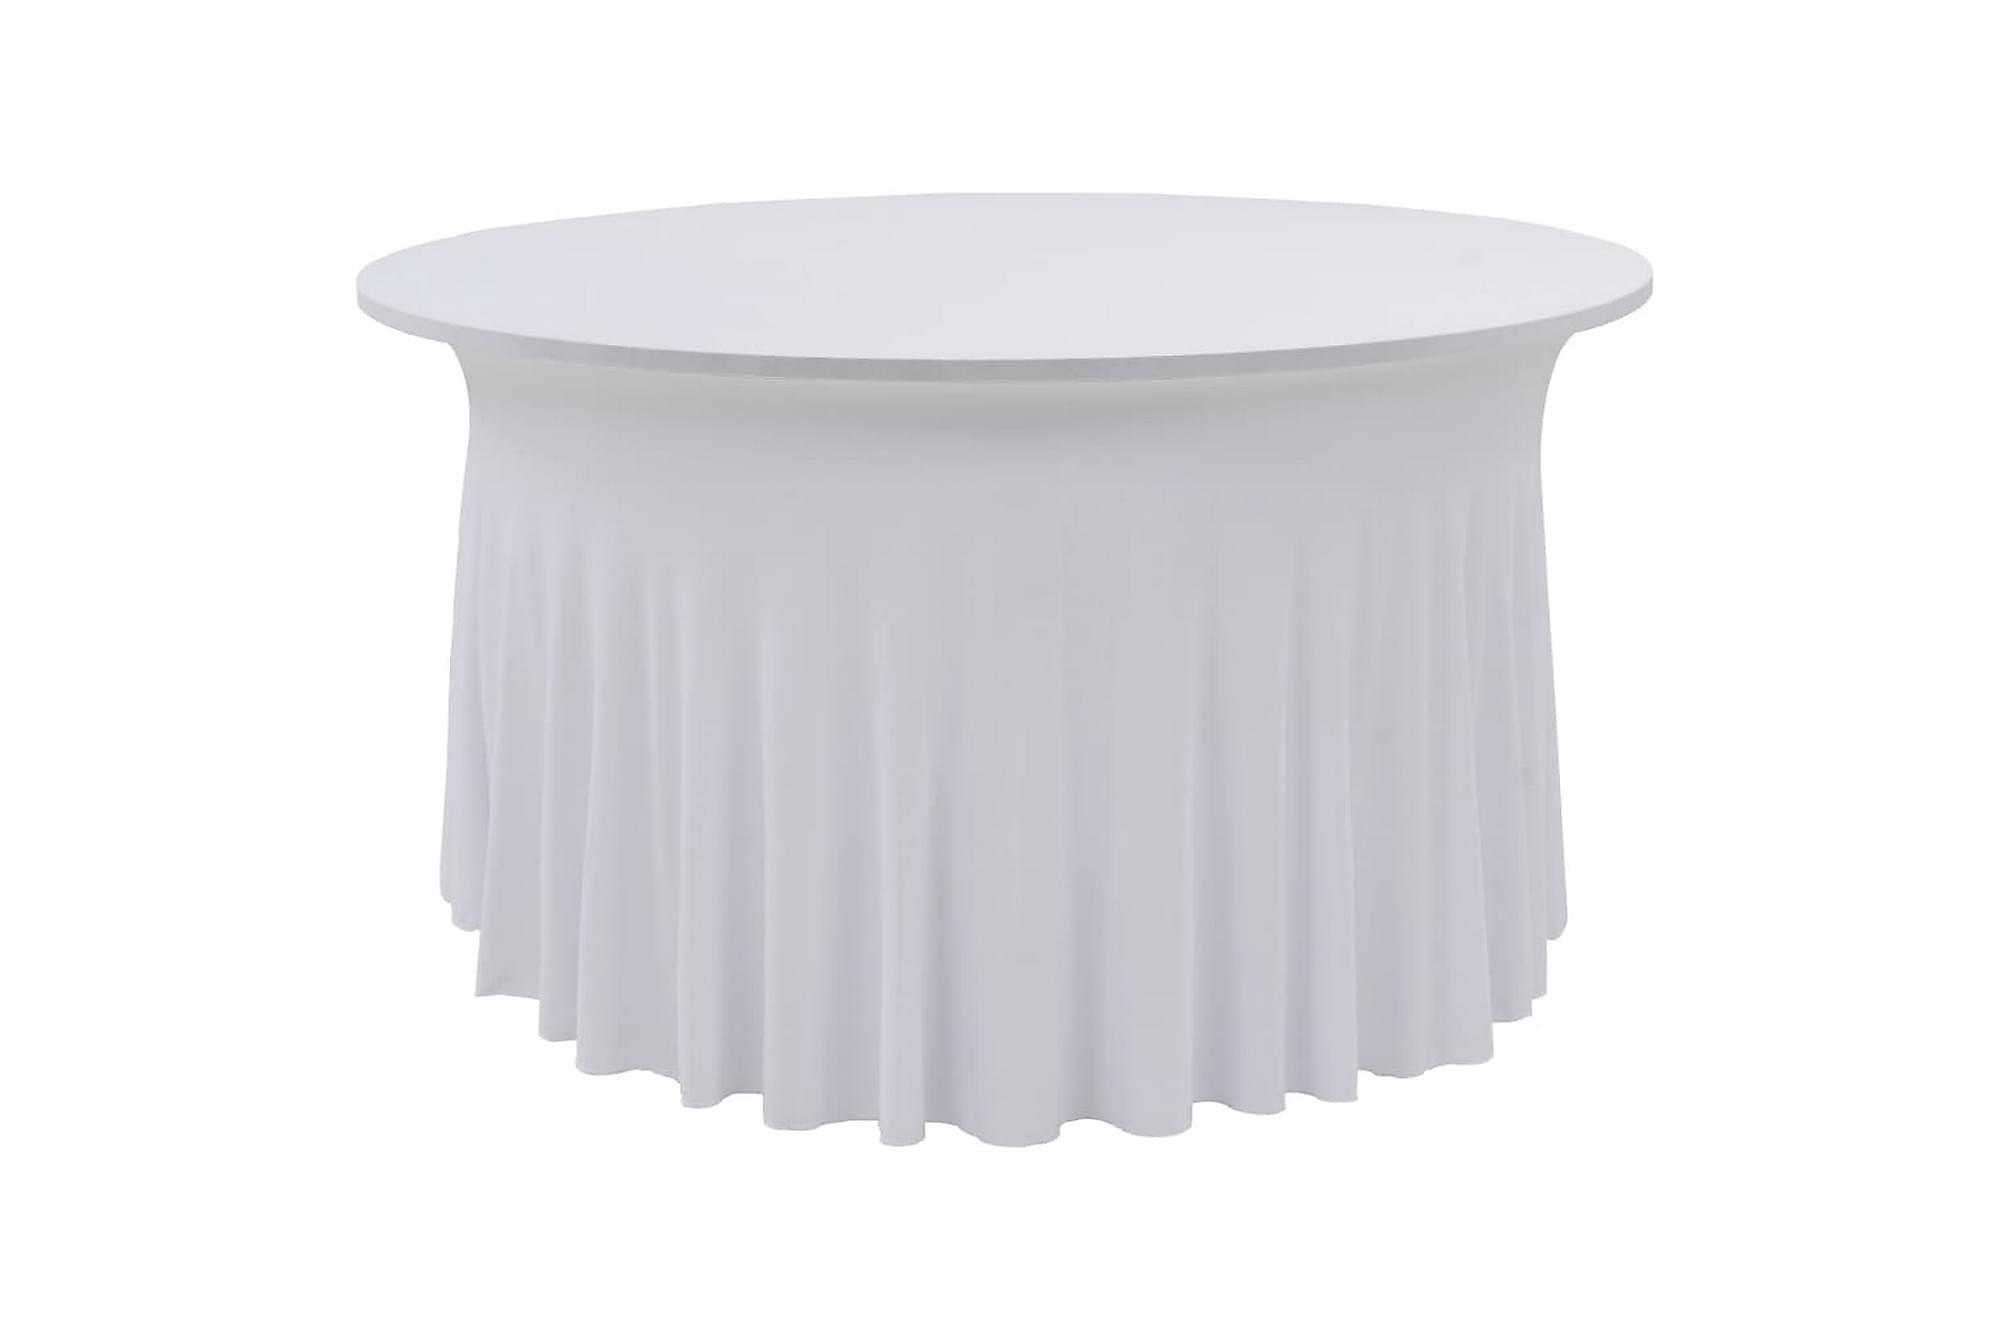 Bordsöverdrag 2 st stretch golvlångt vit 180x74 cm, Möbelöverdrag